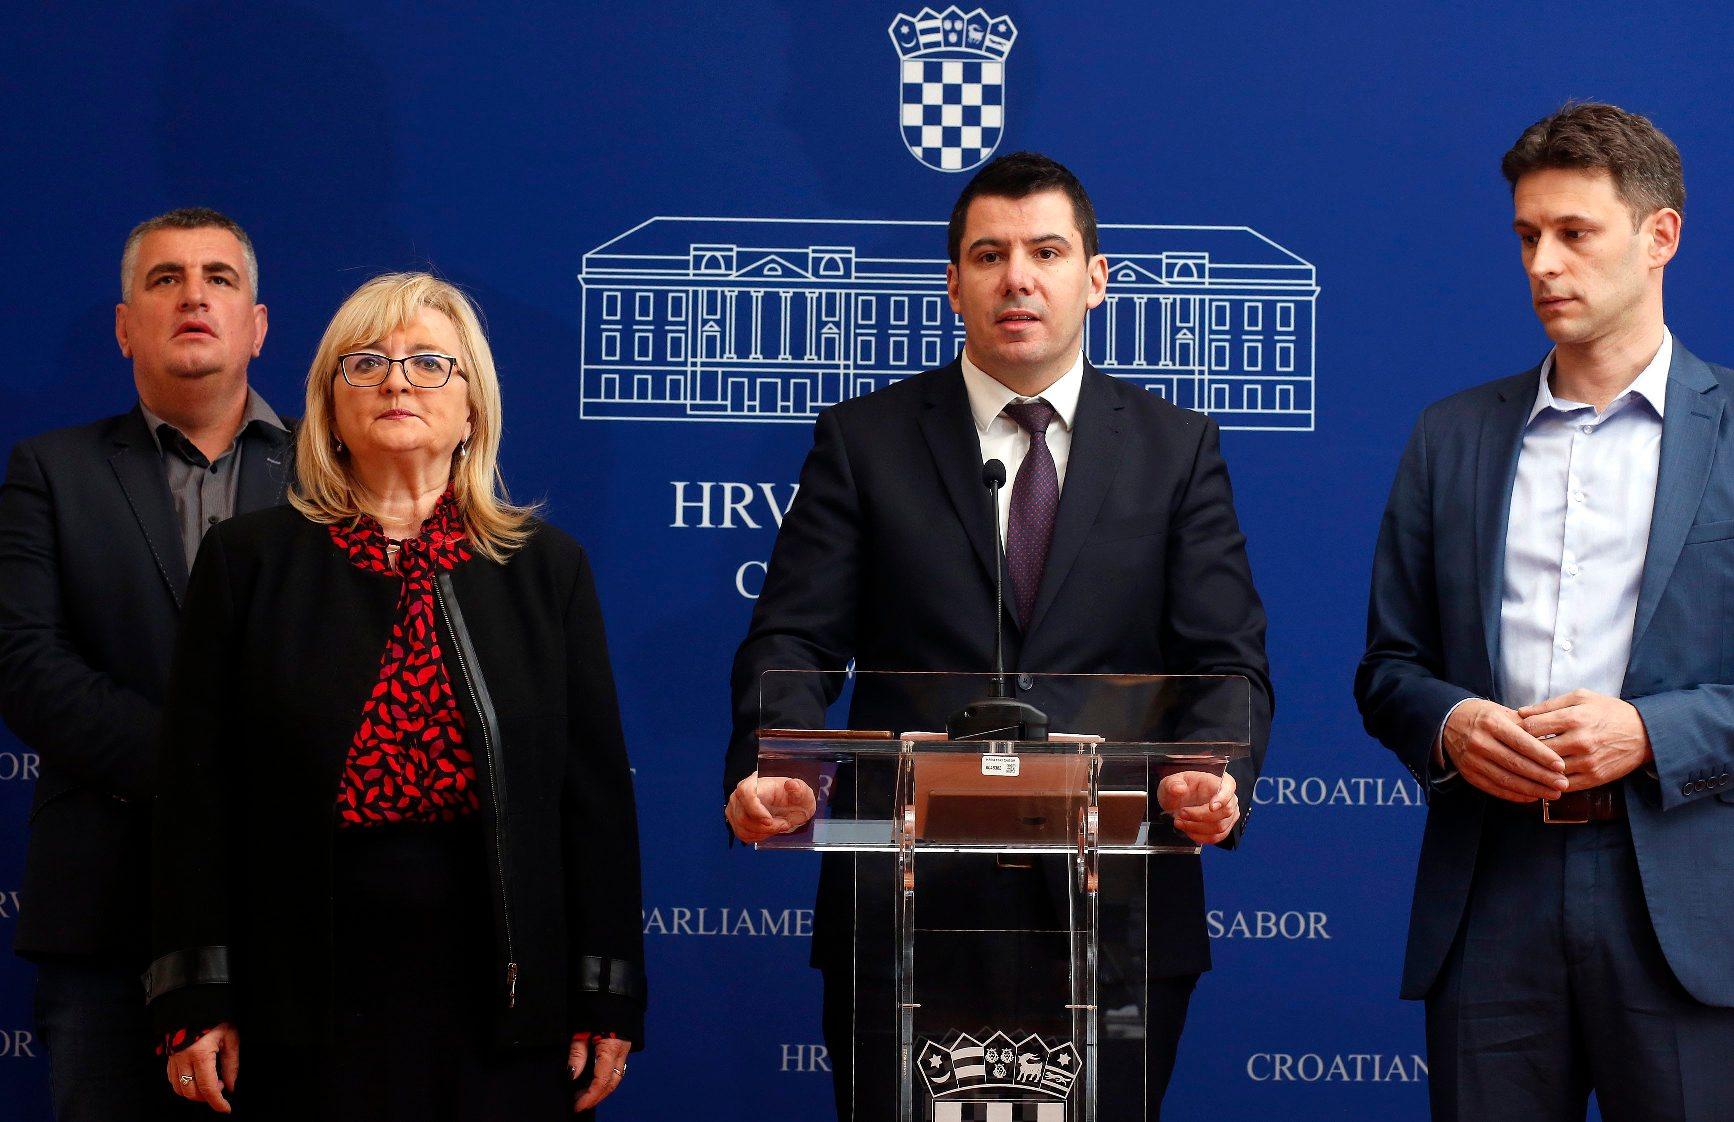 Na fotografiji: Miro Bulj, Ines Strenja Linić, Nikola Grmoja, Božo Petrov